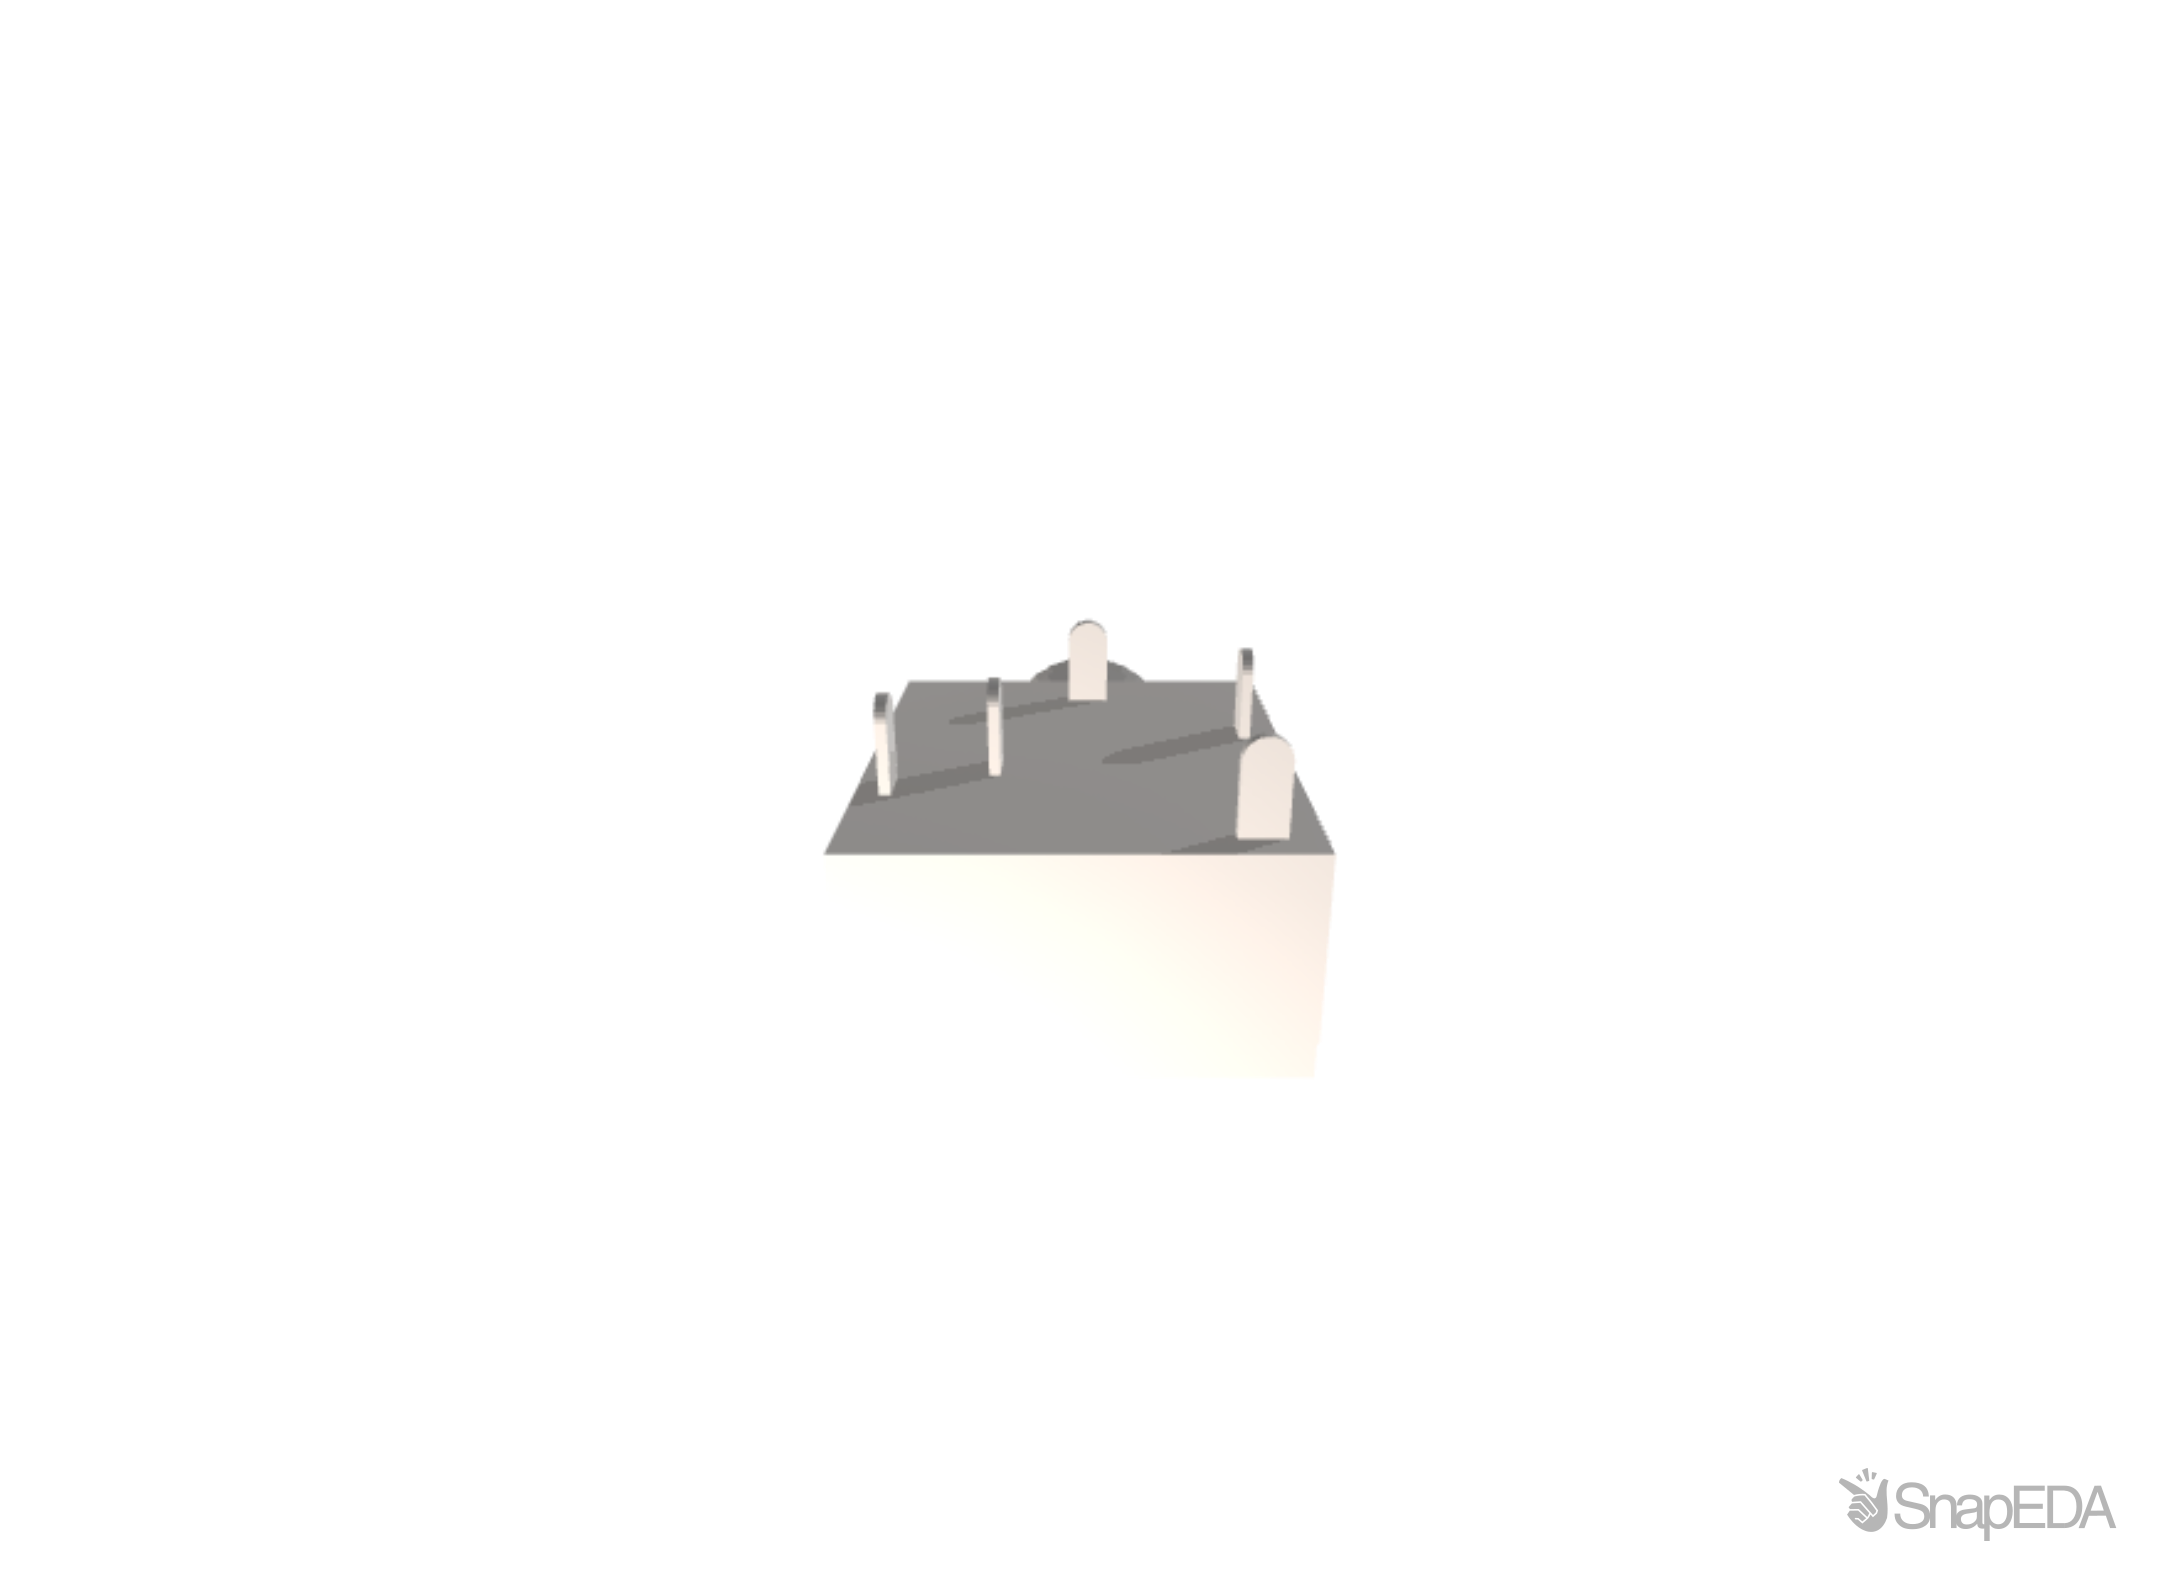 35RAPC4BH3 3D Model